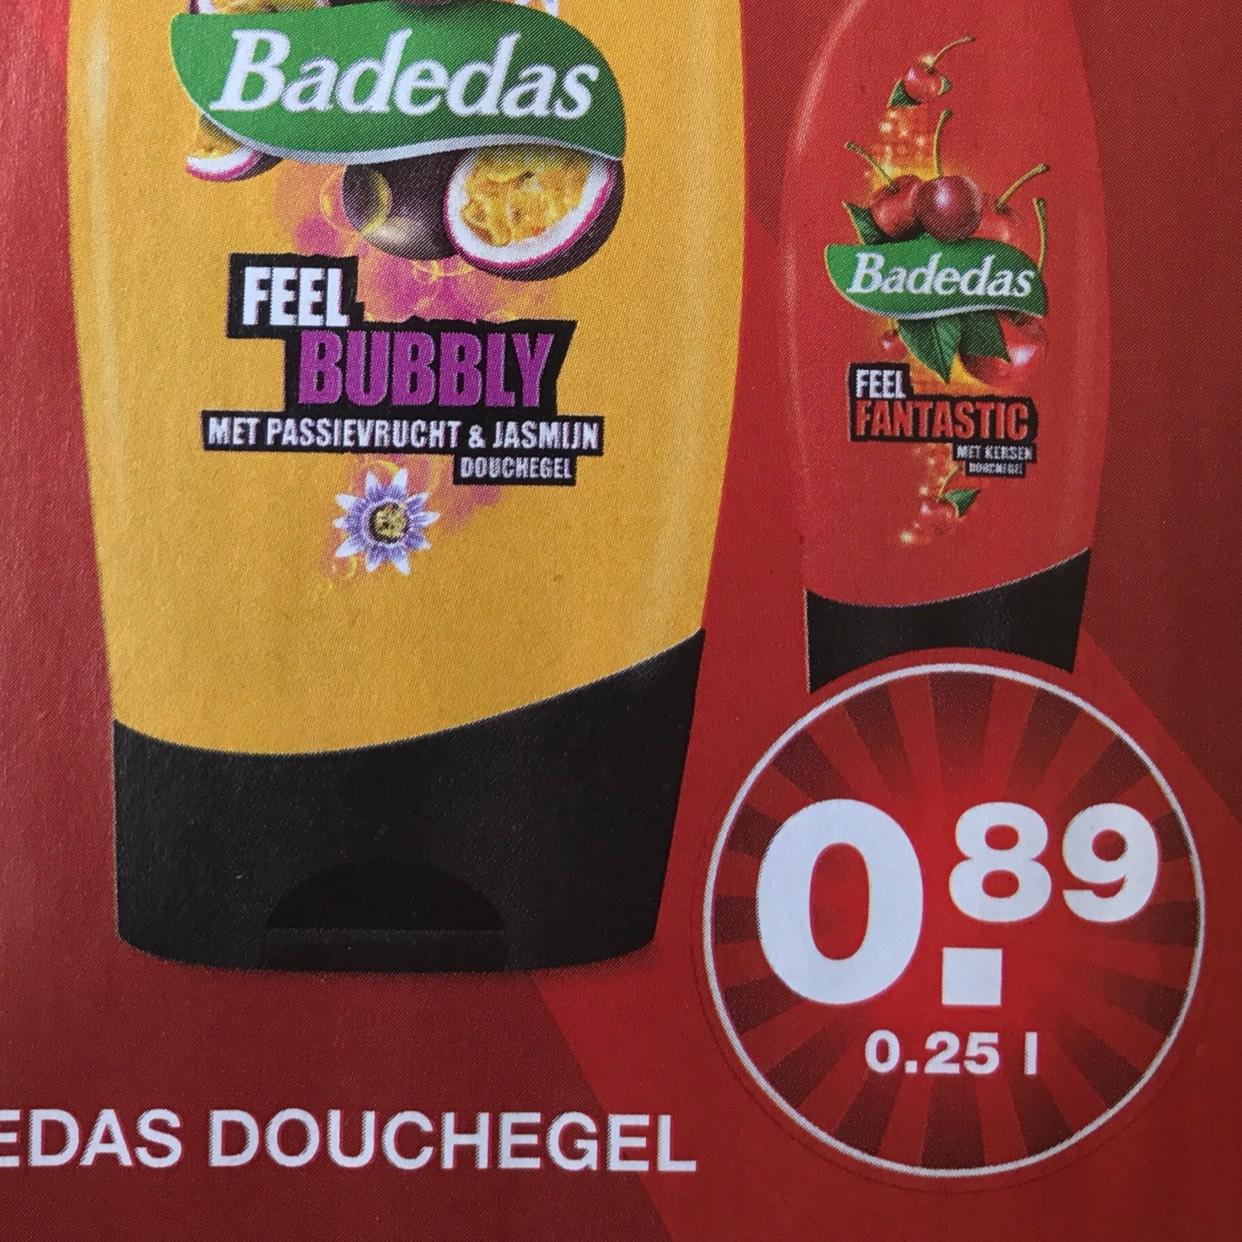 [REMINDER] Badedas douchegel voor €0,89 @ Aldi